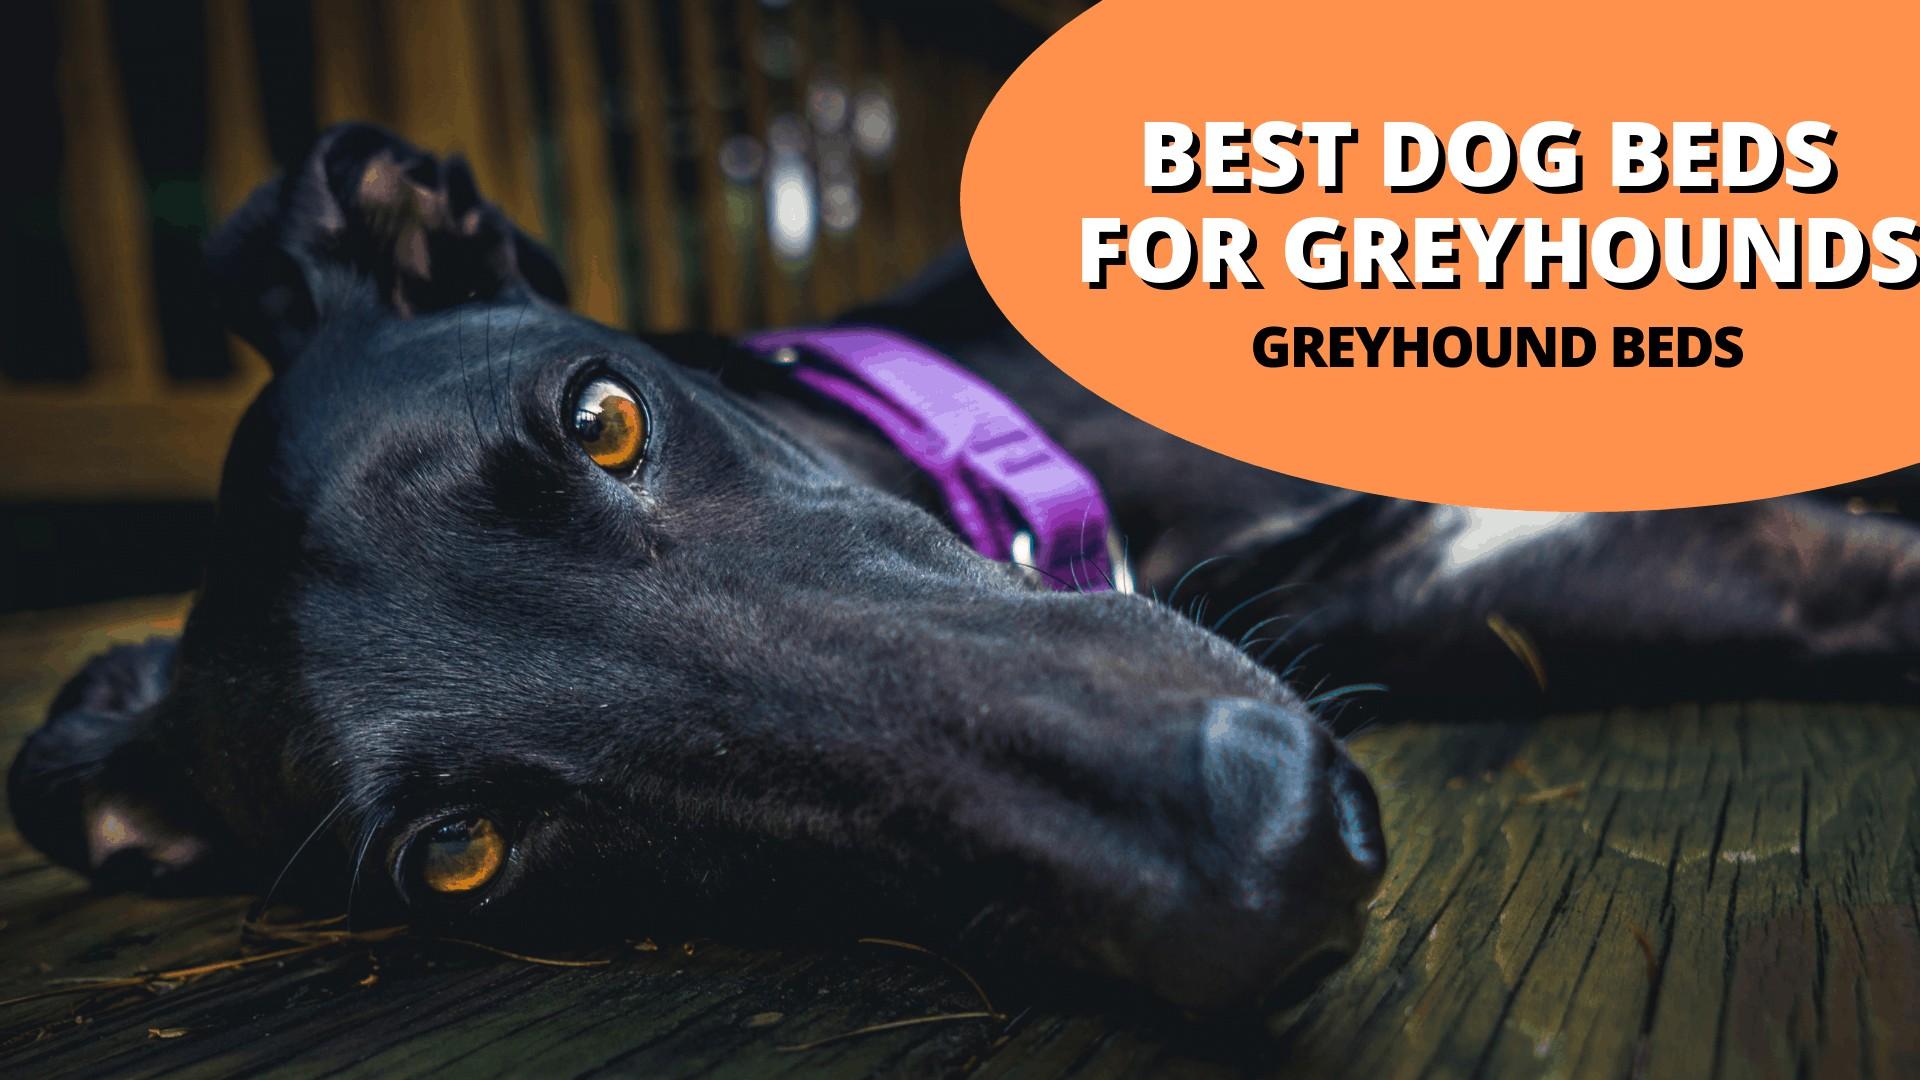 best dog beds for greyhounds (Greyhound beds)